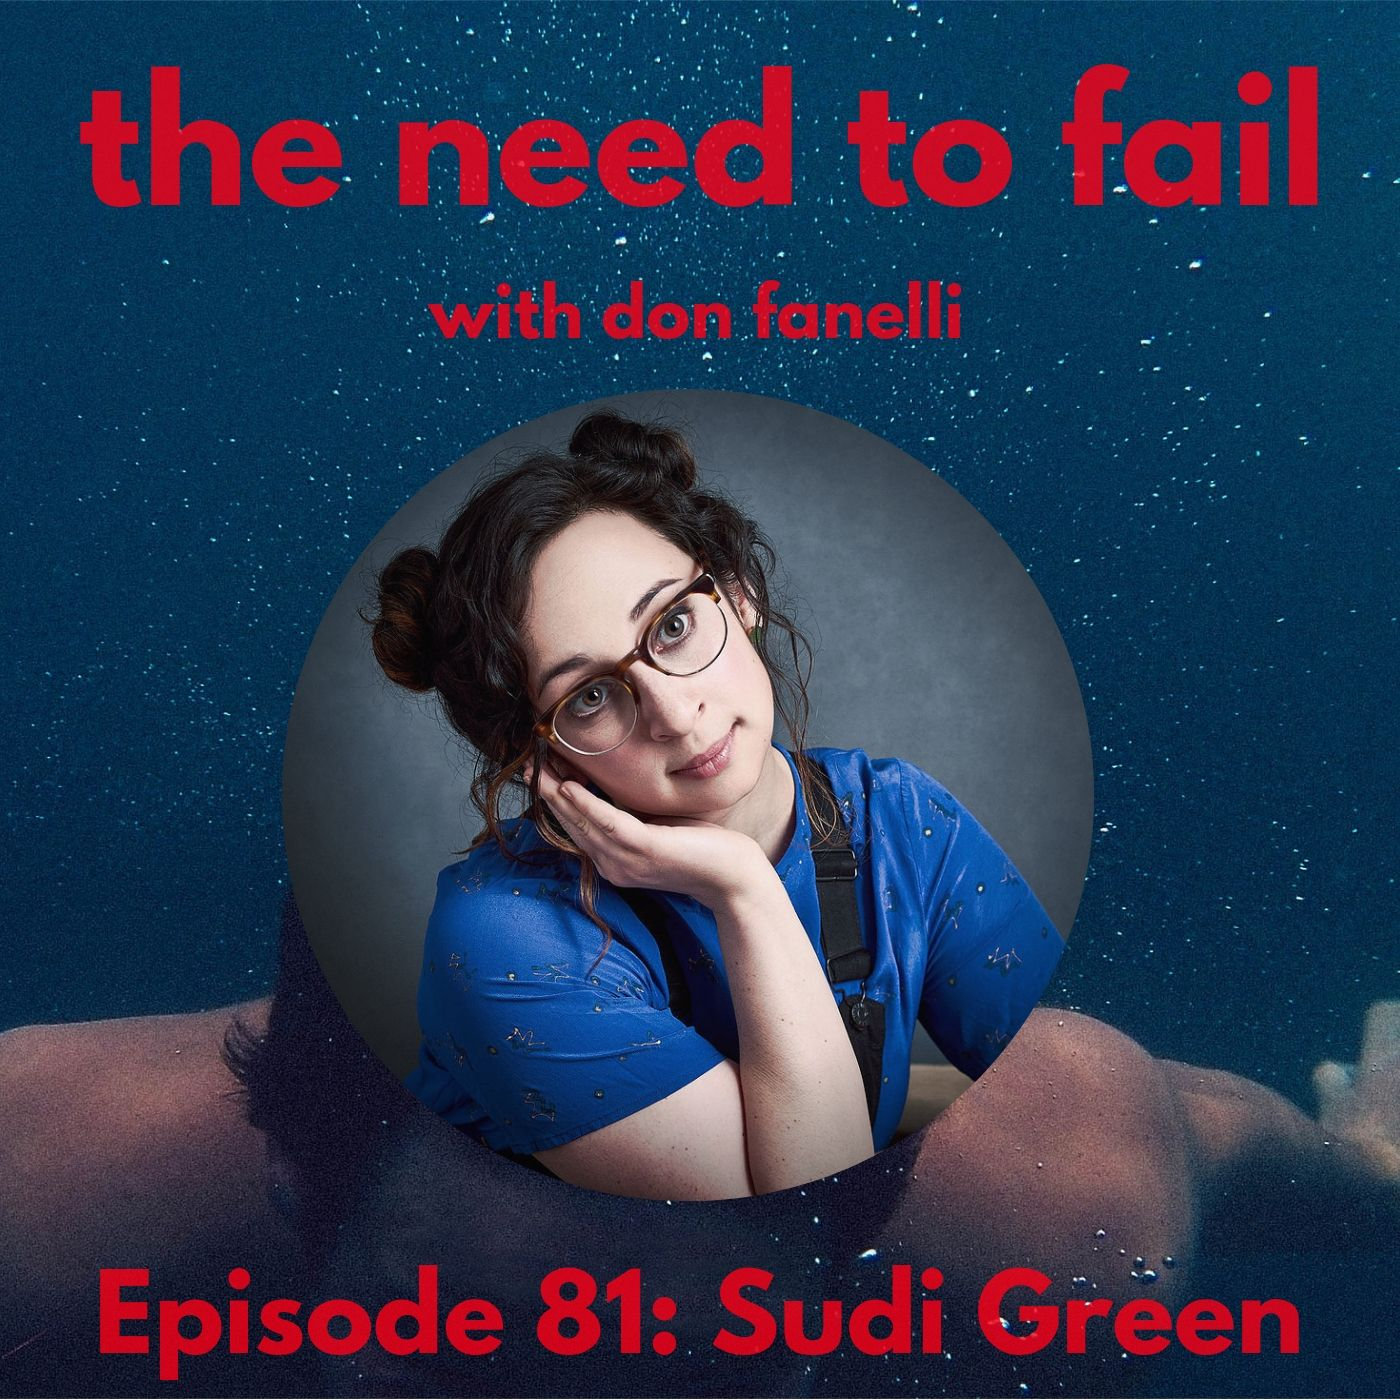 Episode 81: Sudi Green